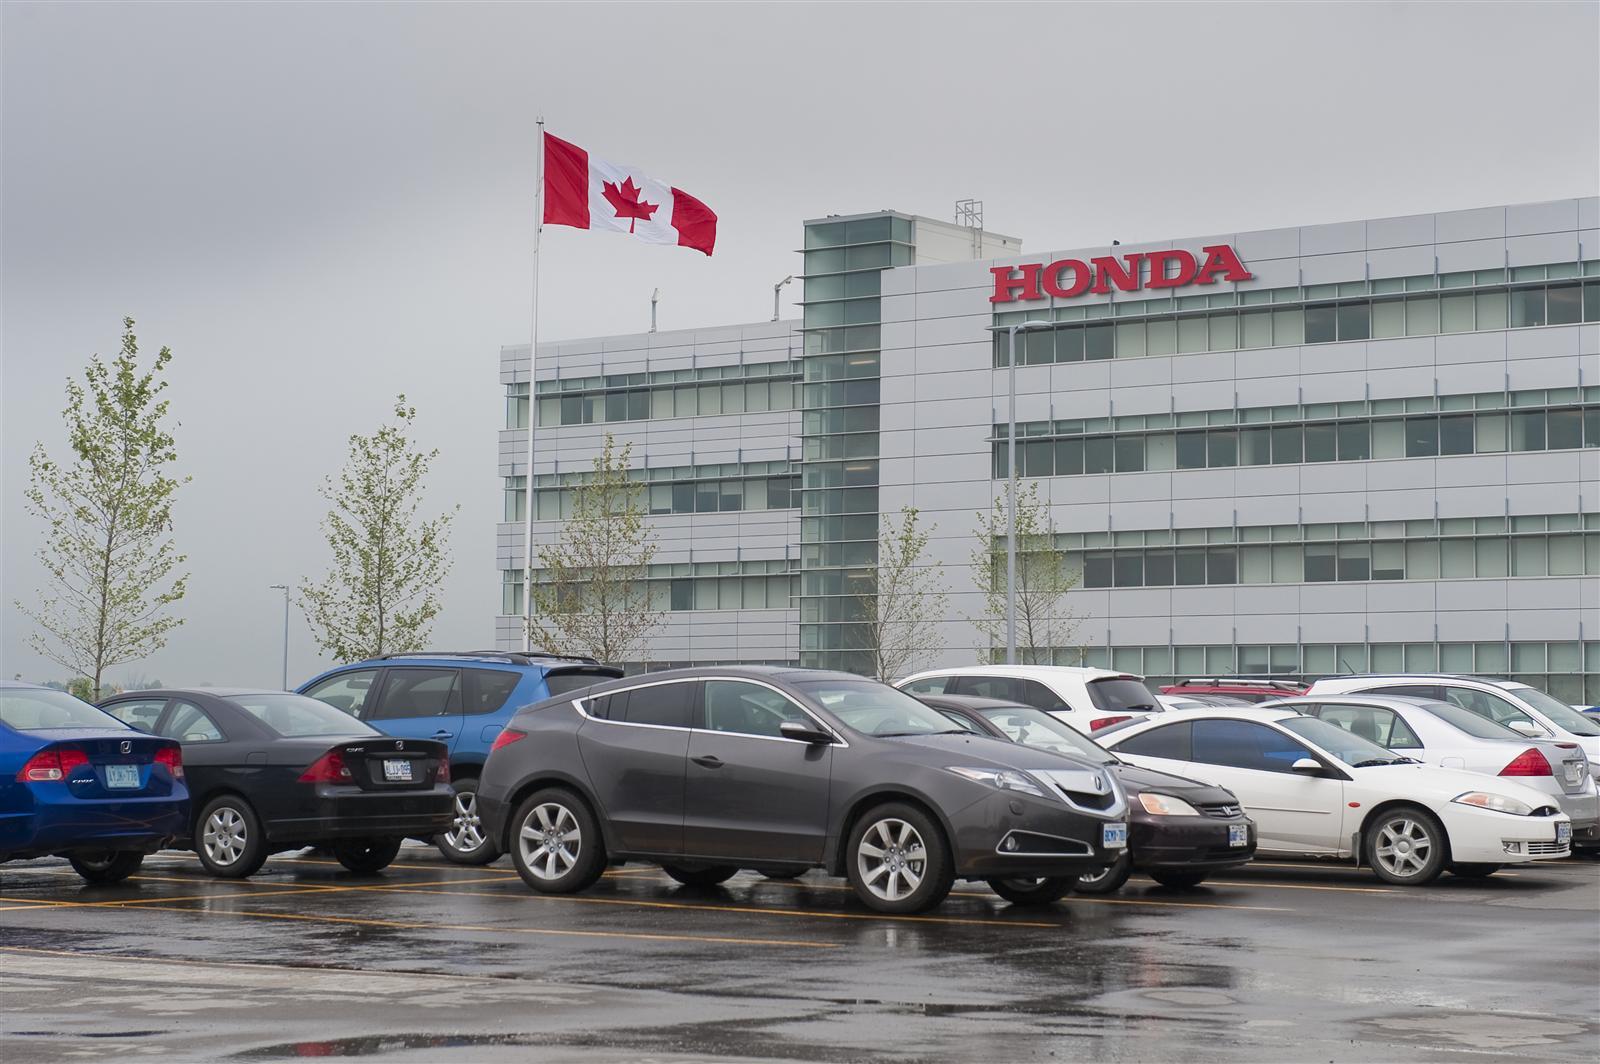 Lithia Dodge Missoula >> Lithia Motors Corporate Office - impremedia.net